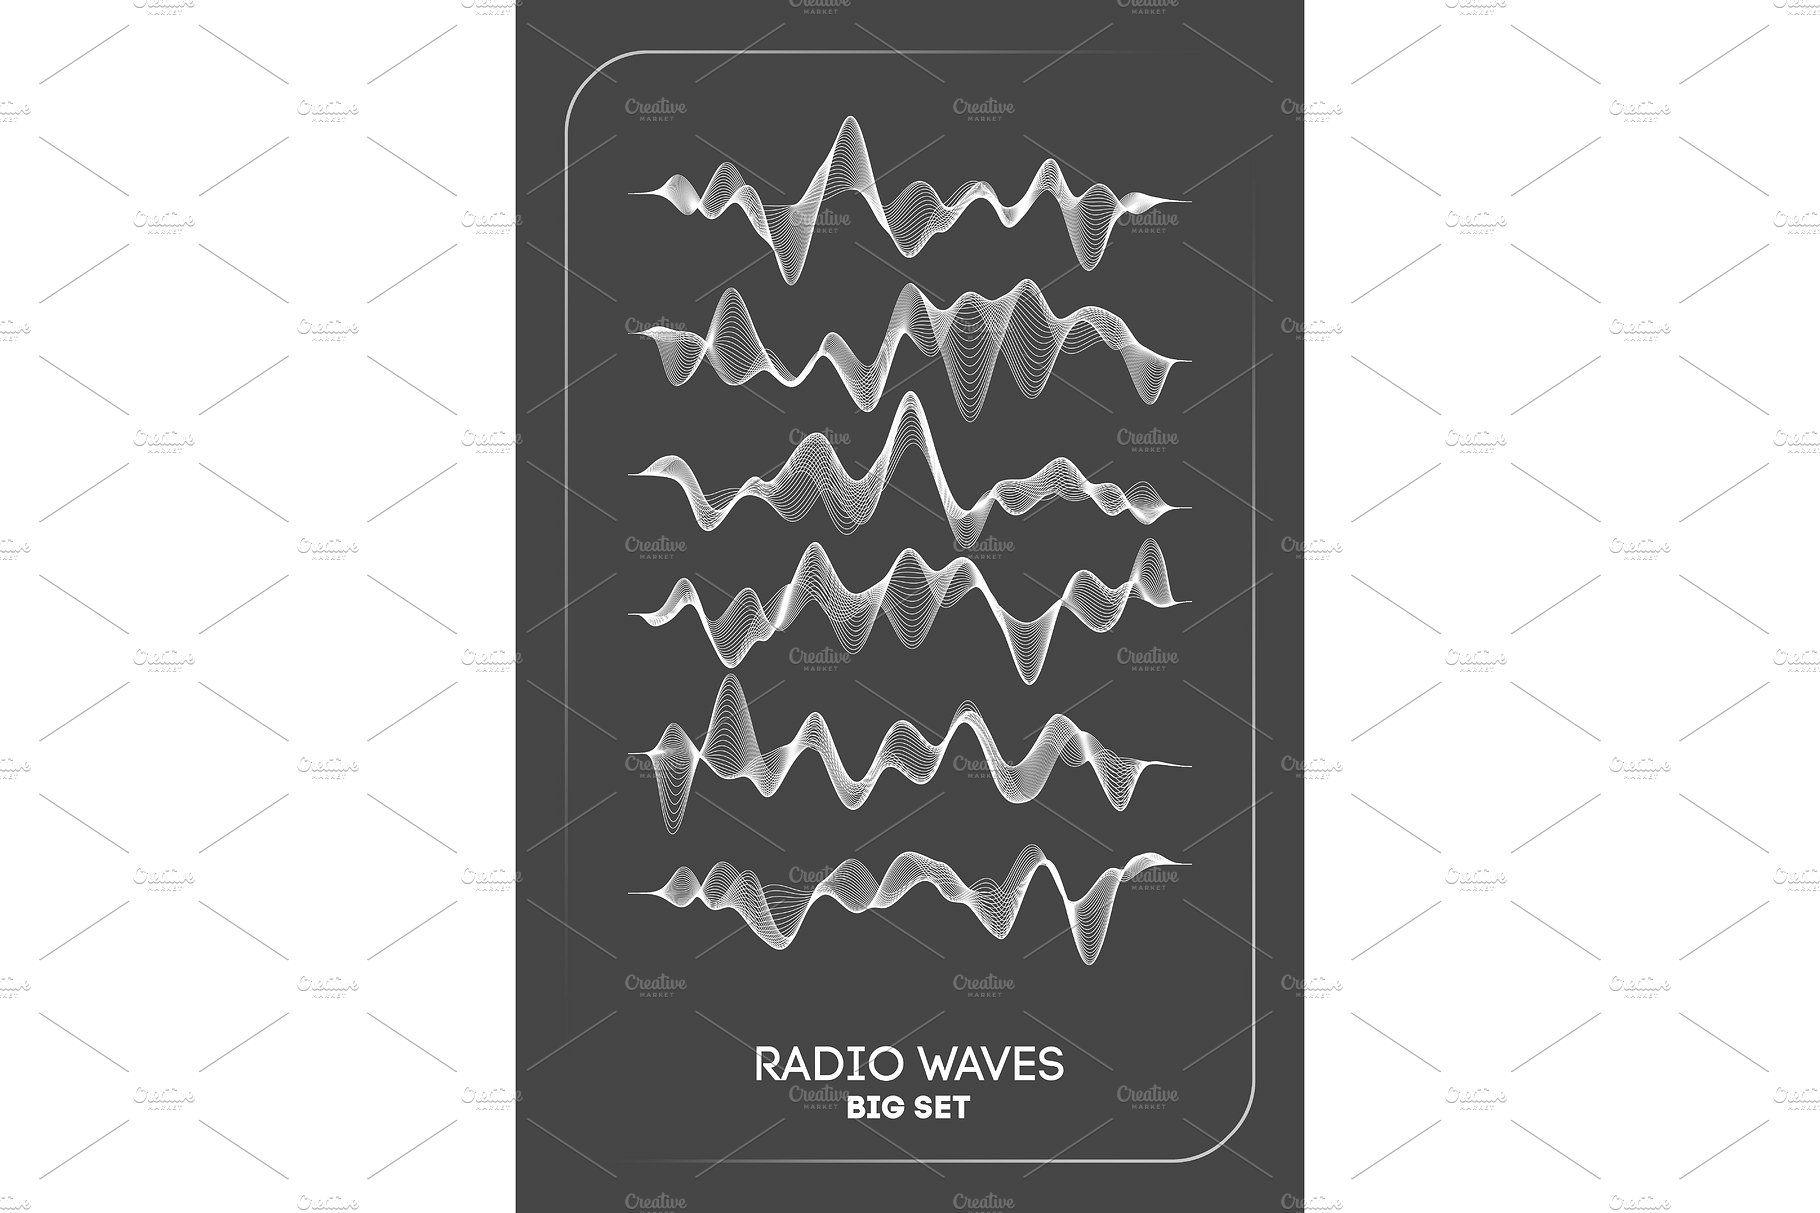 Radio waves vector. Radio frequency identification